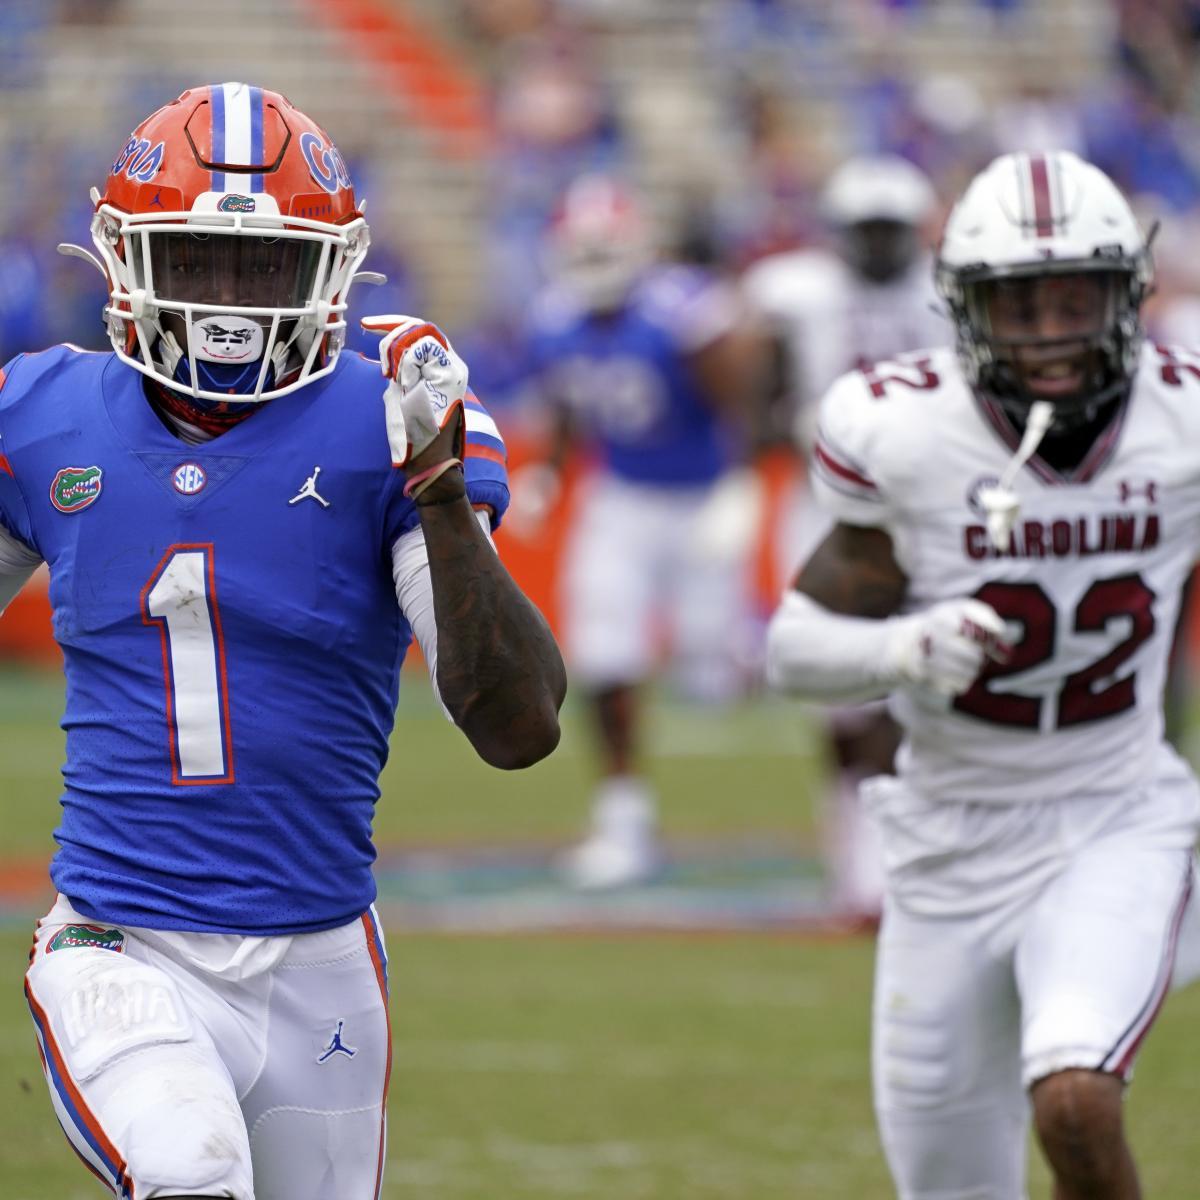 College Football Rankings: B/R's Top 25 After Week 5 – Bleacher Report